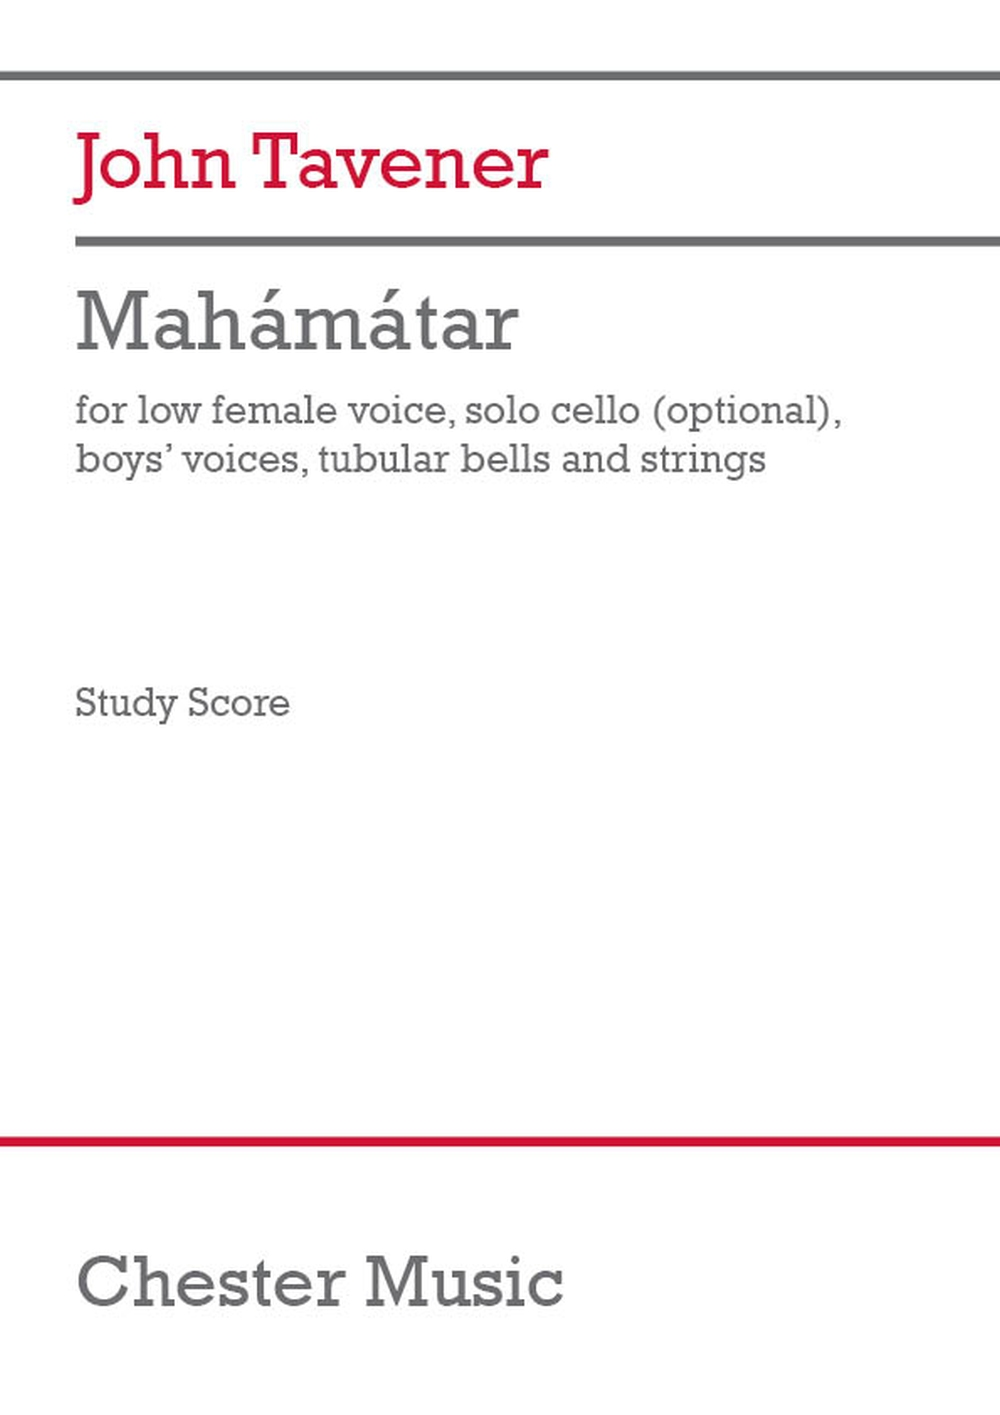 John Tavener: Mahamatar (Study Score): Chamber Ensemble: Study Score